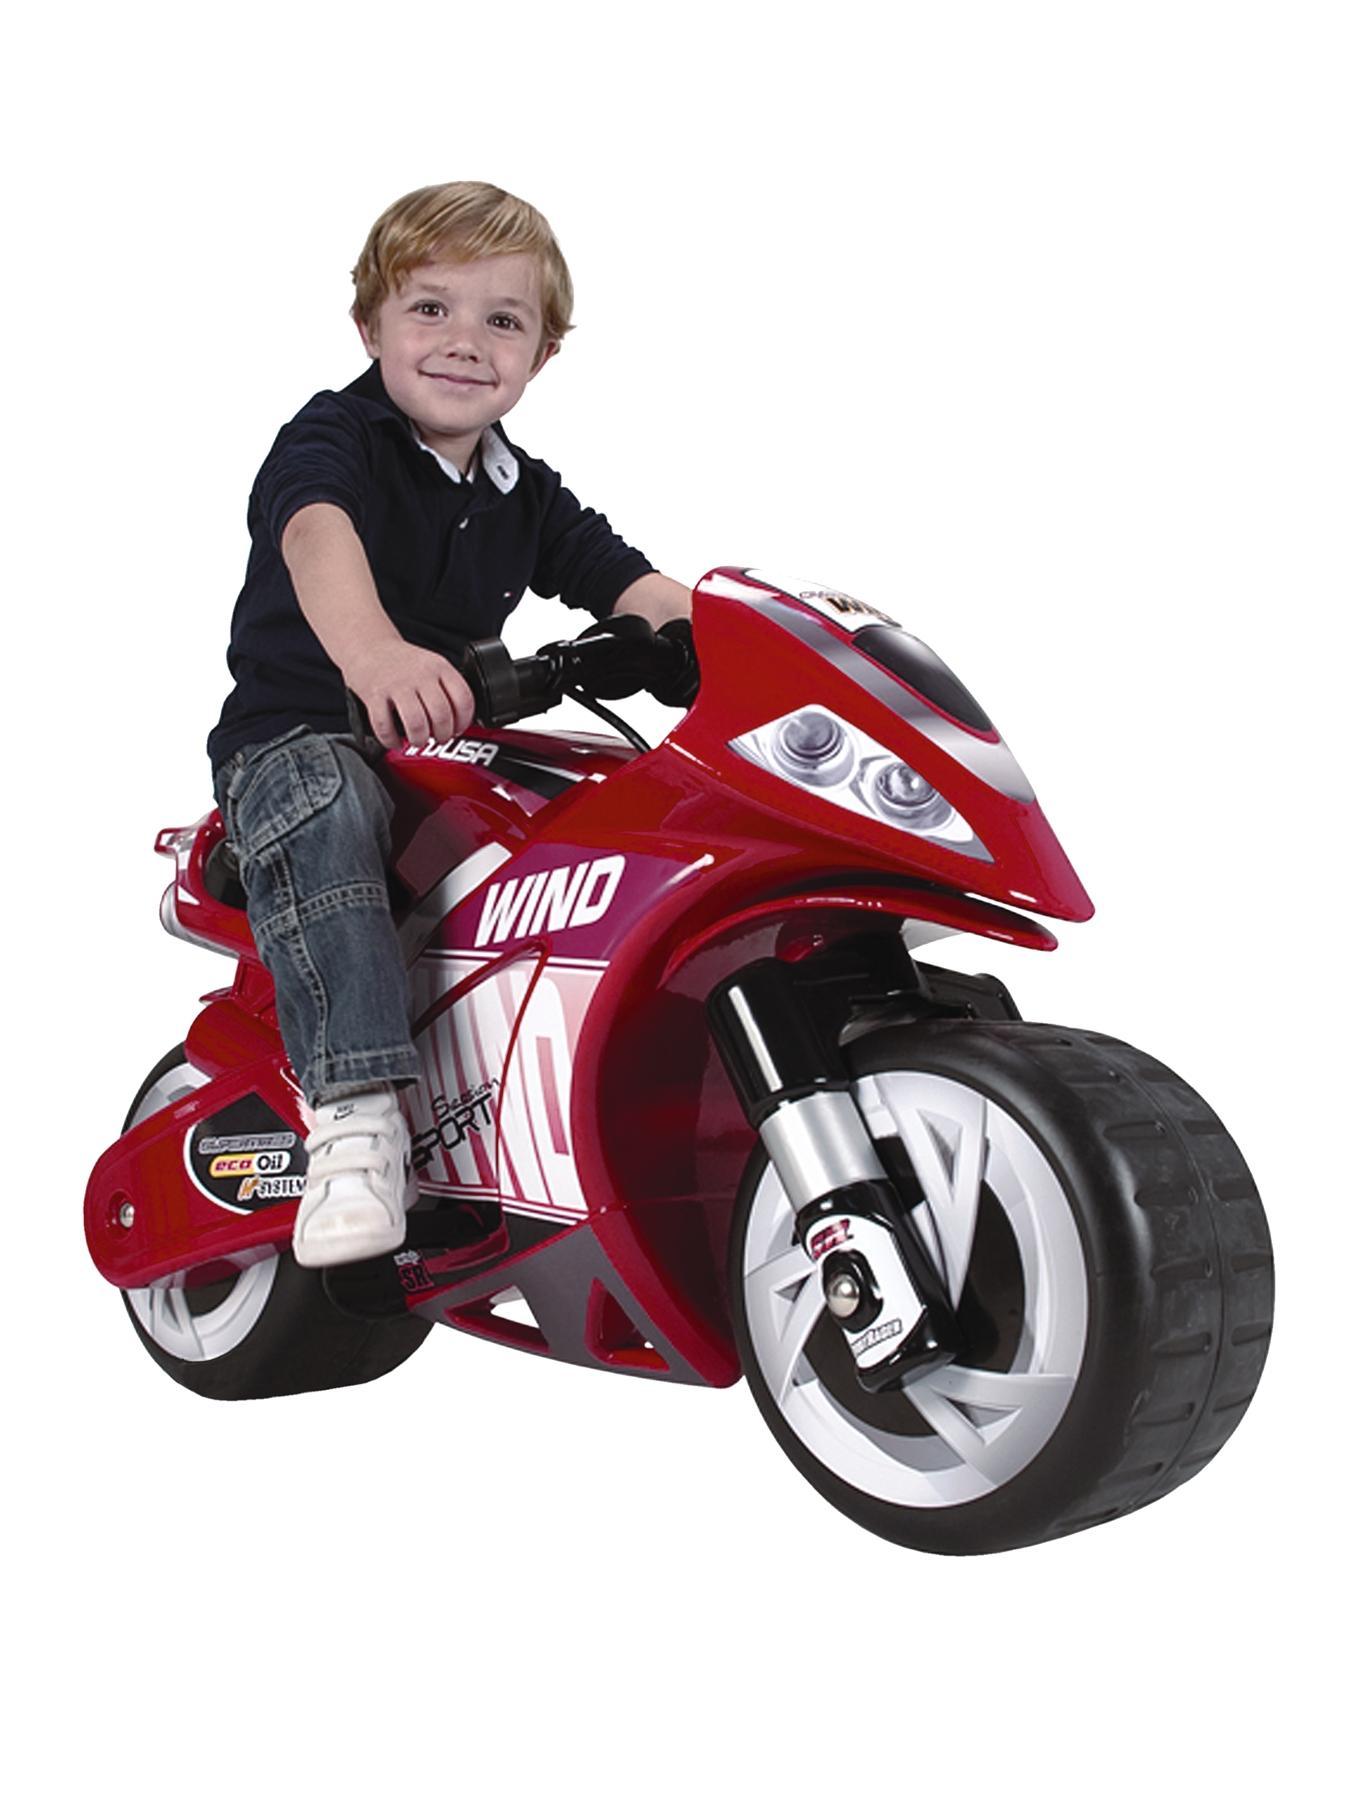 Wind Mototrbike 6 Volt